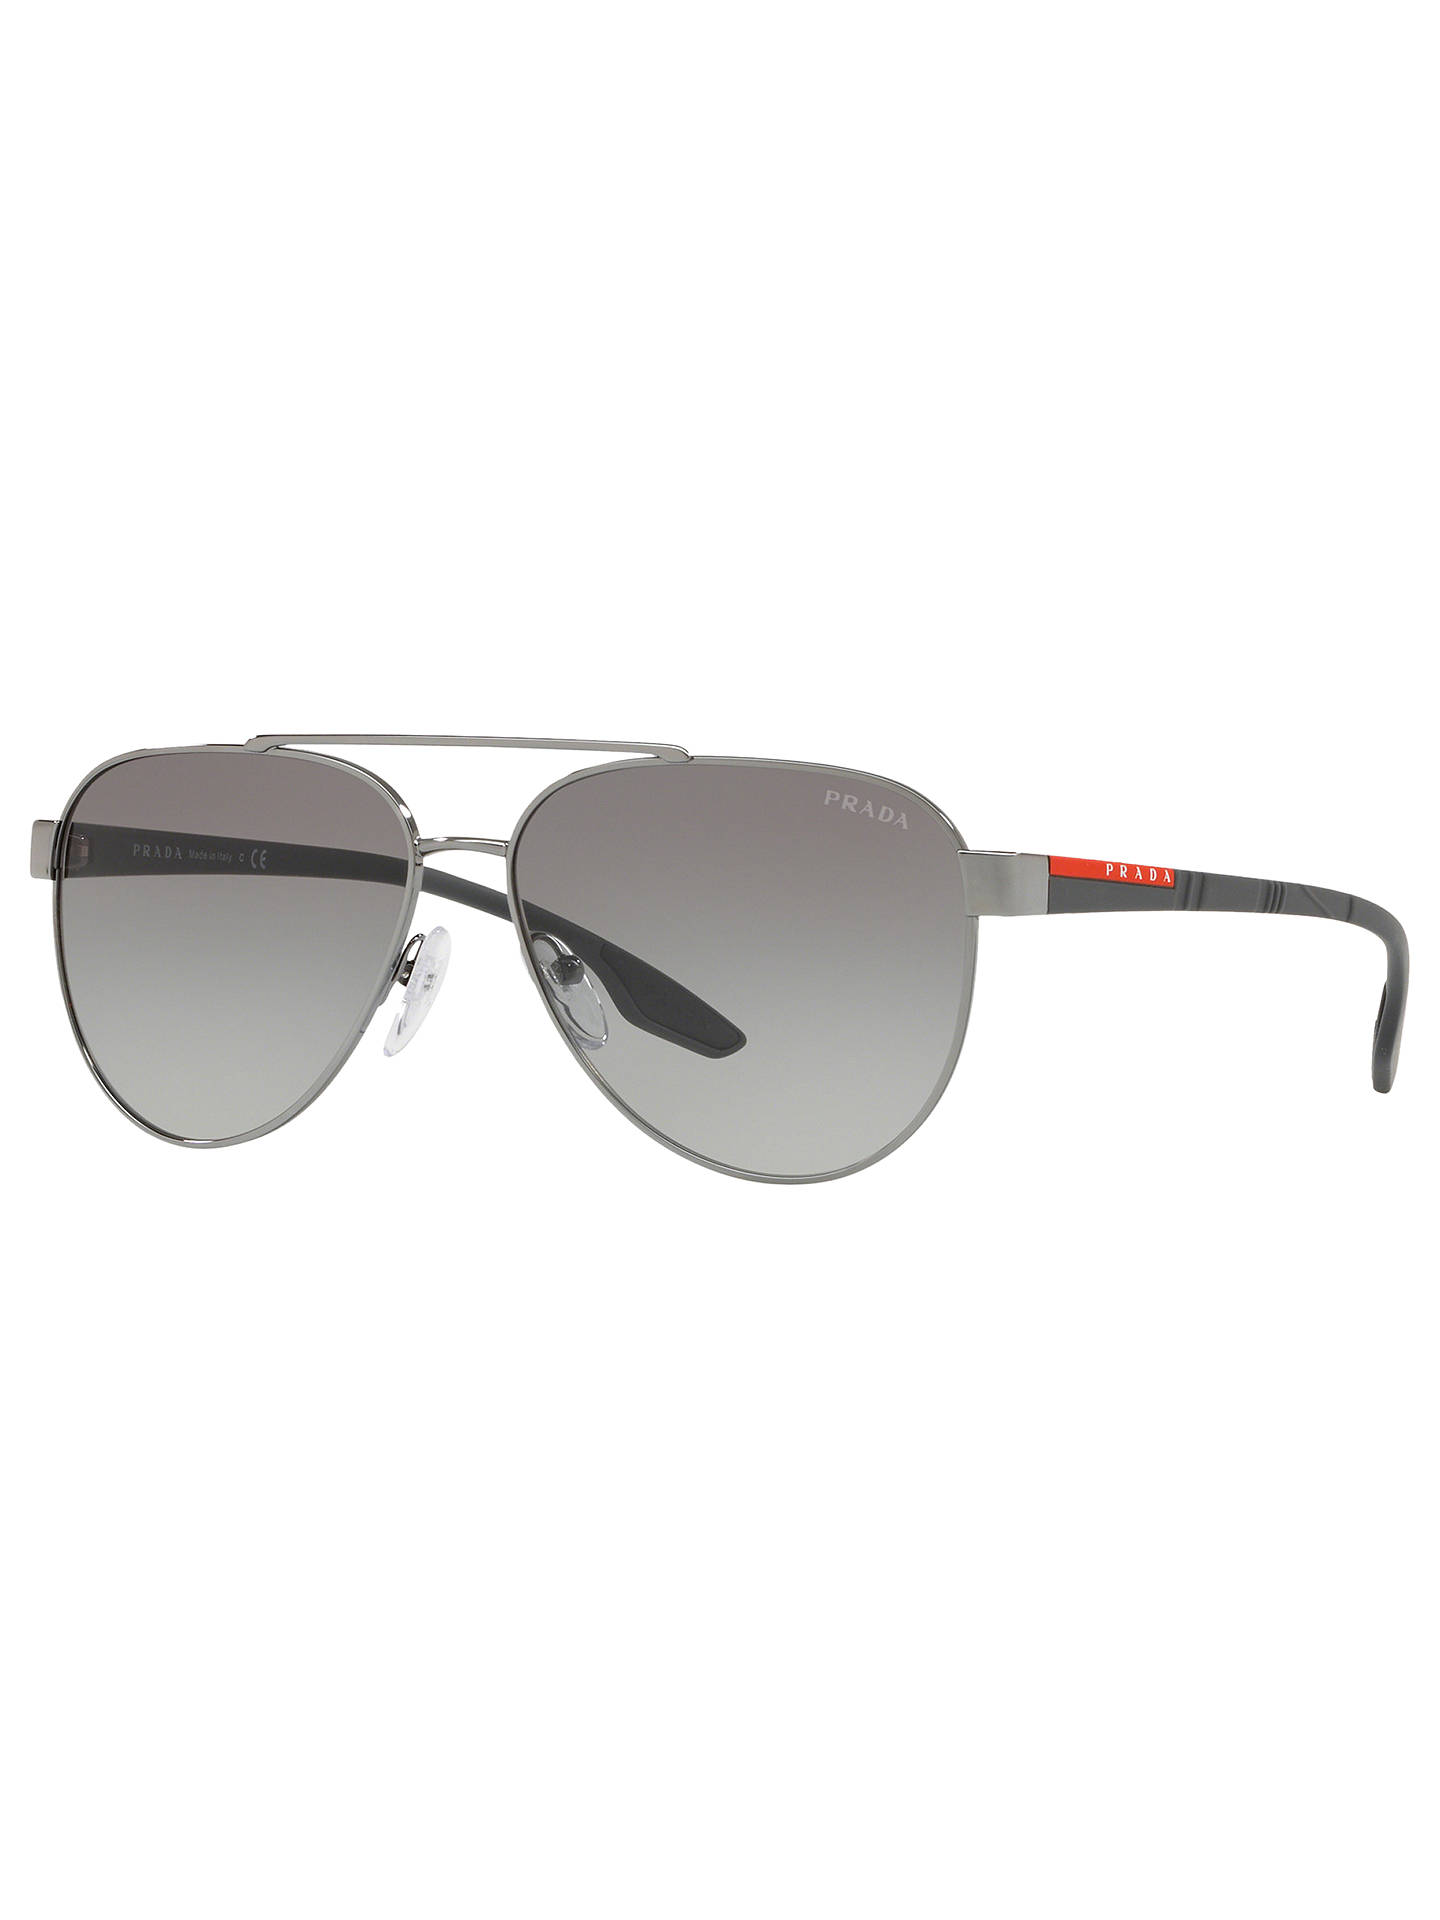 92ace957d053 Buy Prada Linea Rossa PS 54TS Men's Aviator Sunglasses, Gunmetal/Grey  Gradient Online at ...